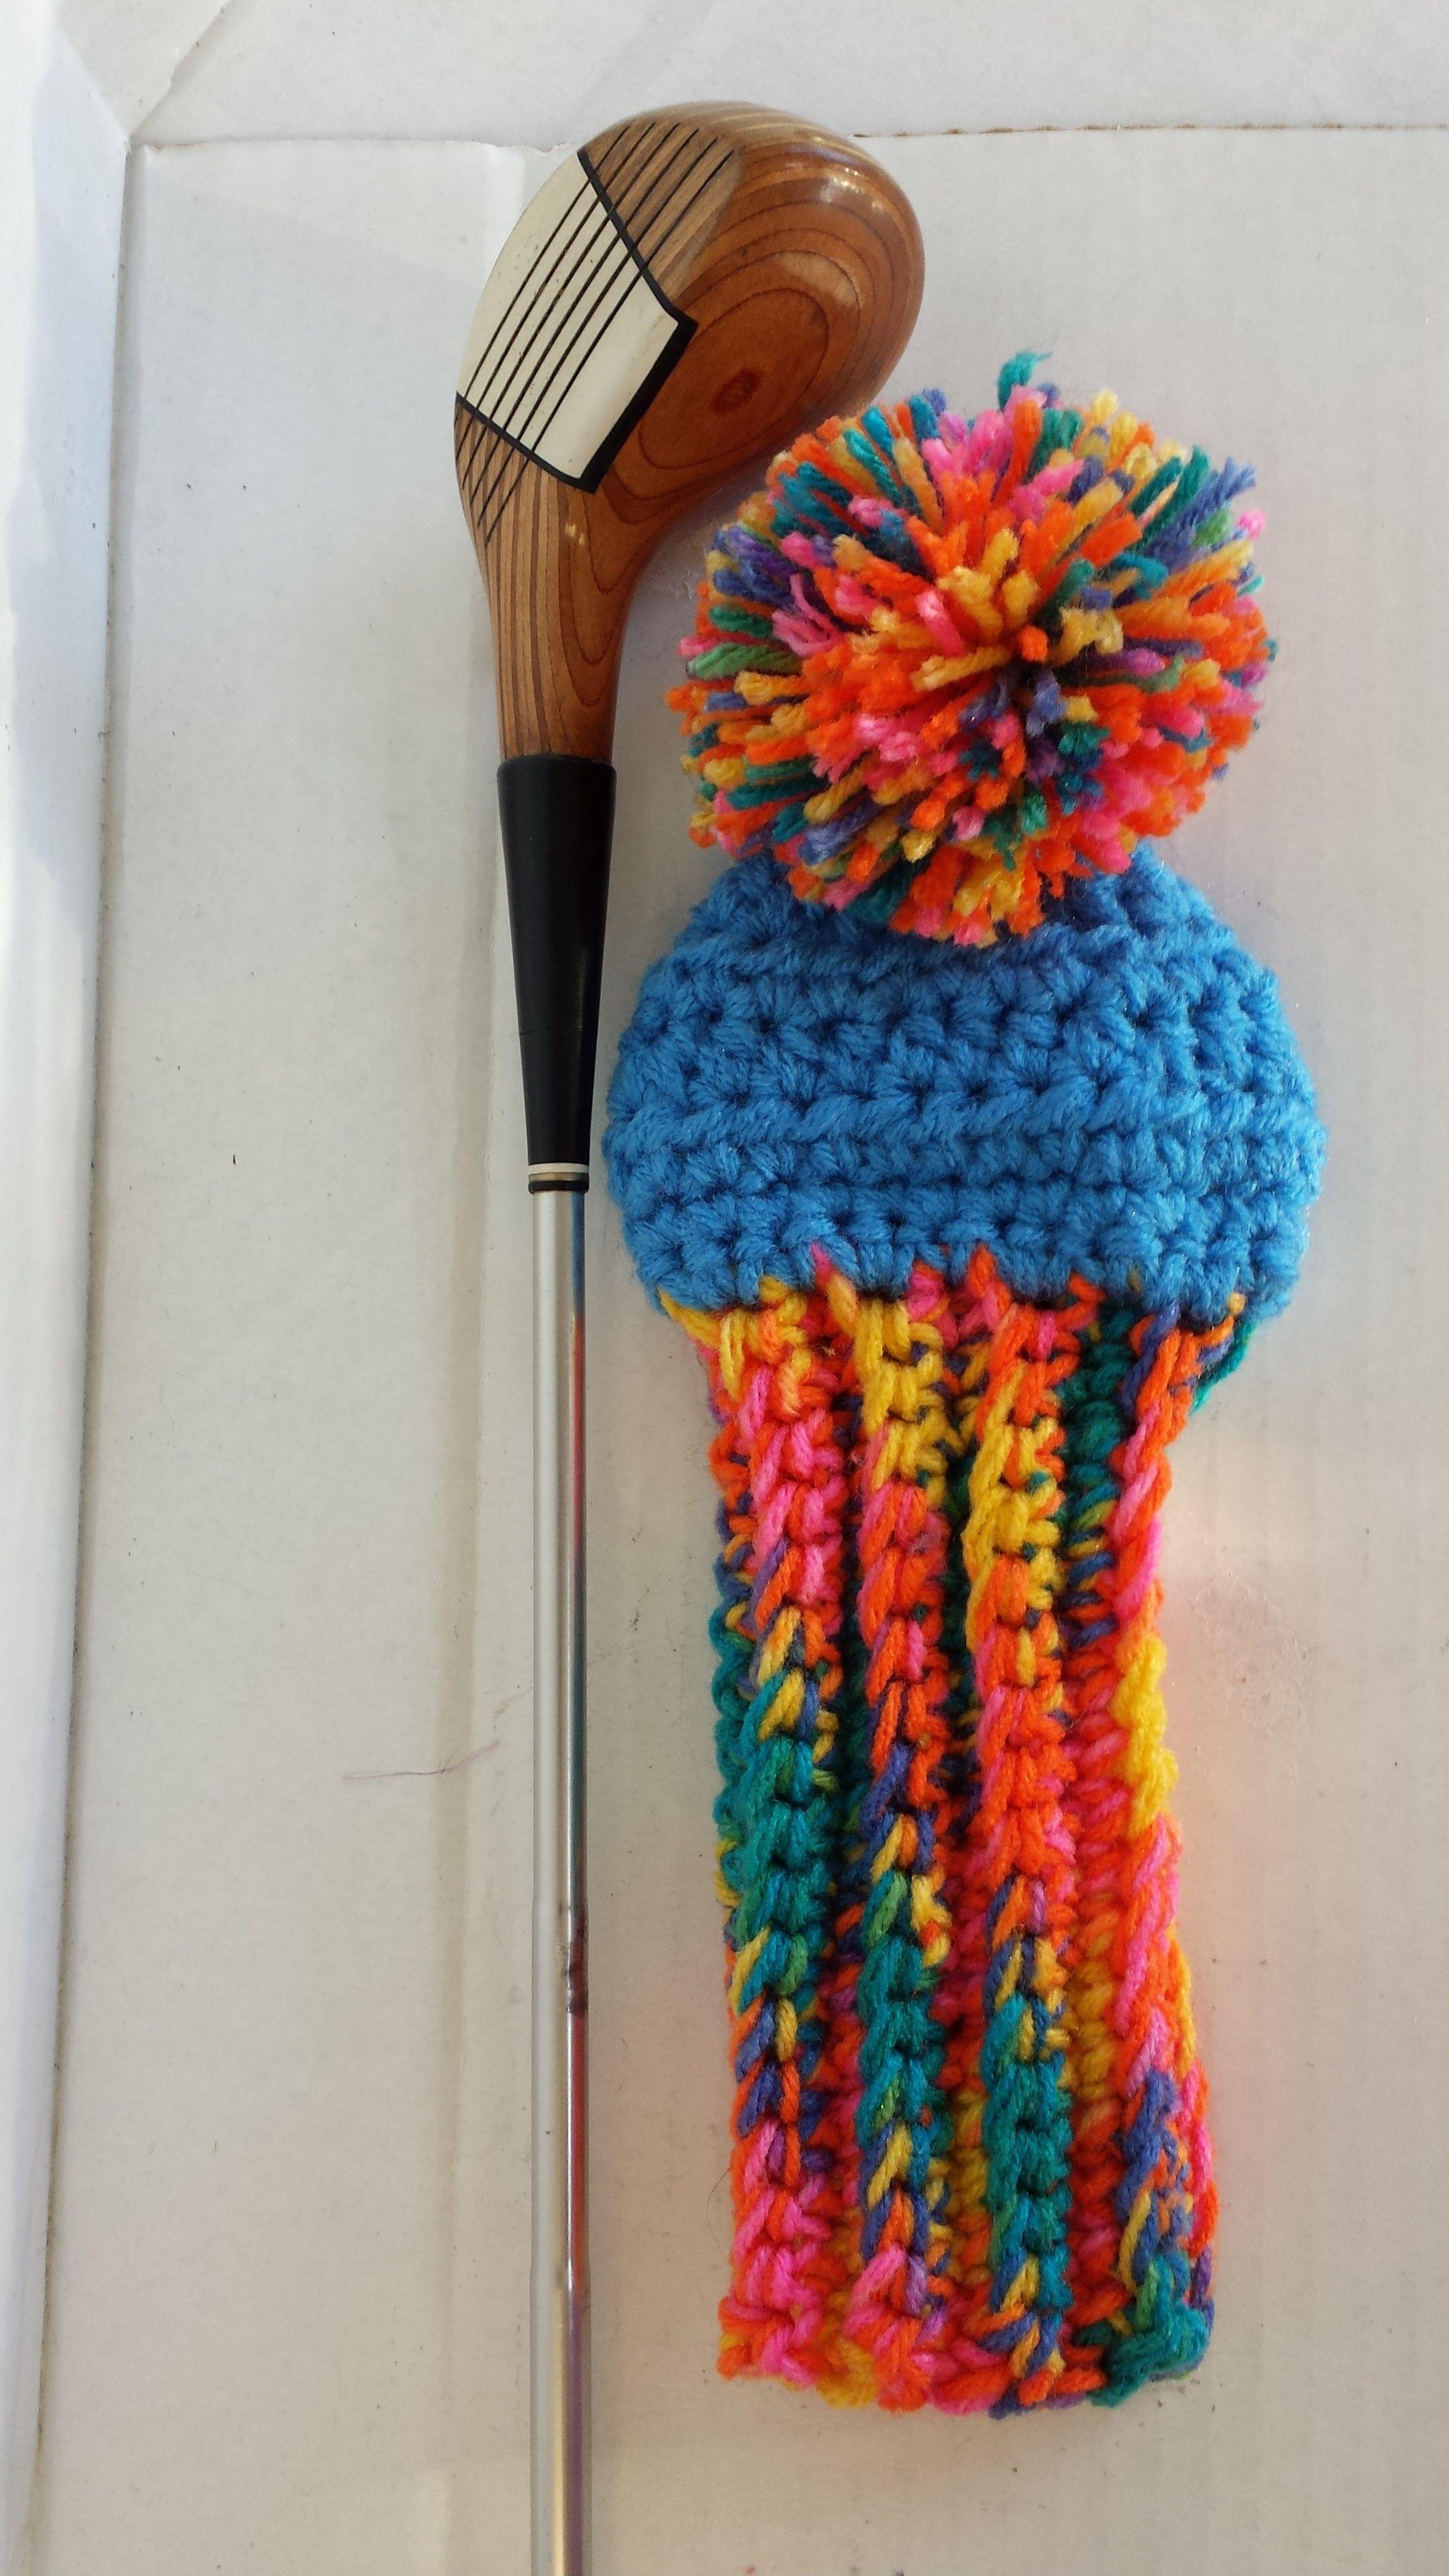 Fun golf club covers a carolyns crocheted headwear pinterest fun golf club covers bankloansurffo Images